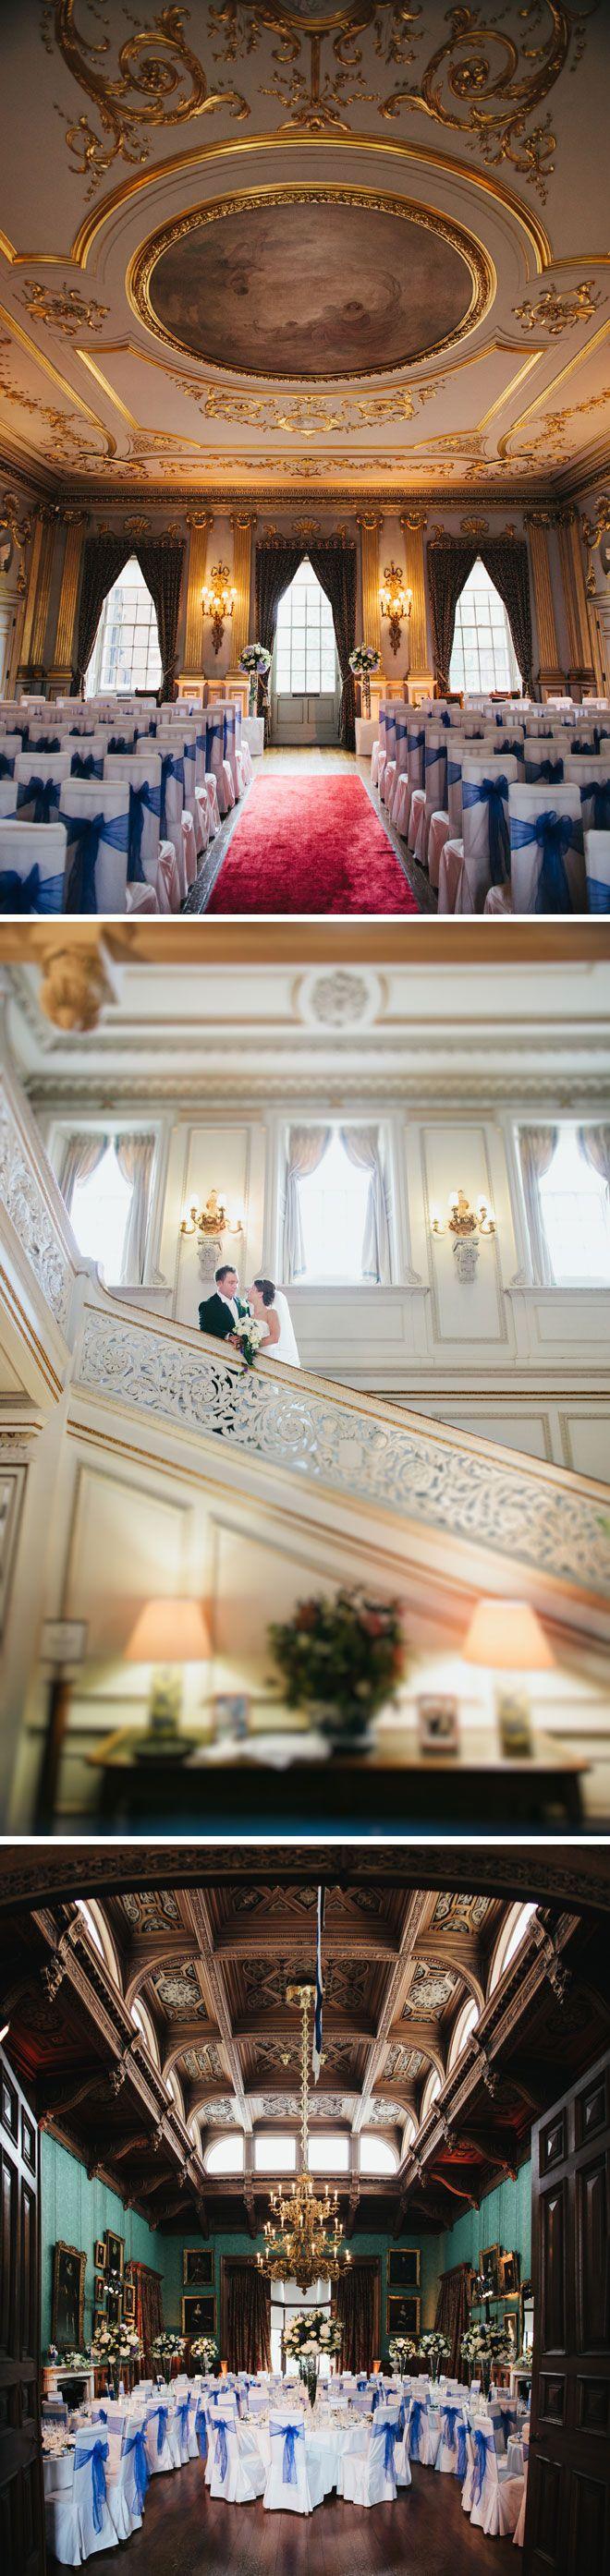 Knowsley Hall wedding venue in Merseyside | Visit www.wedding-venues.co.uk